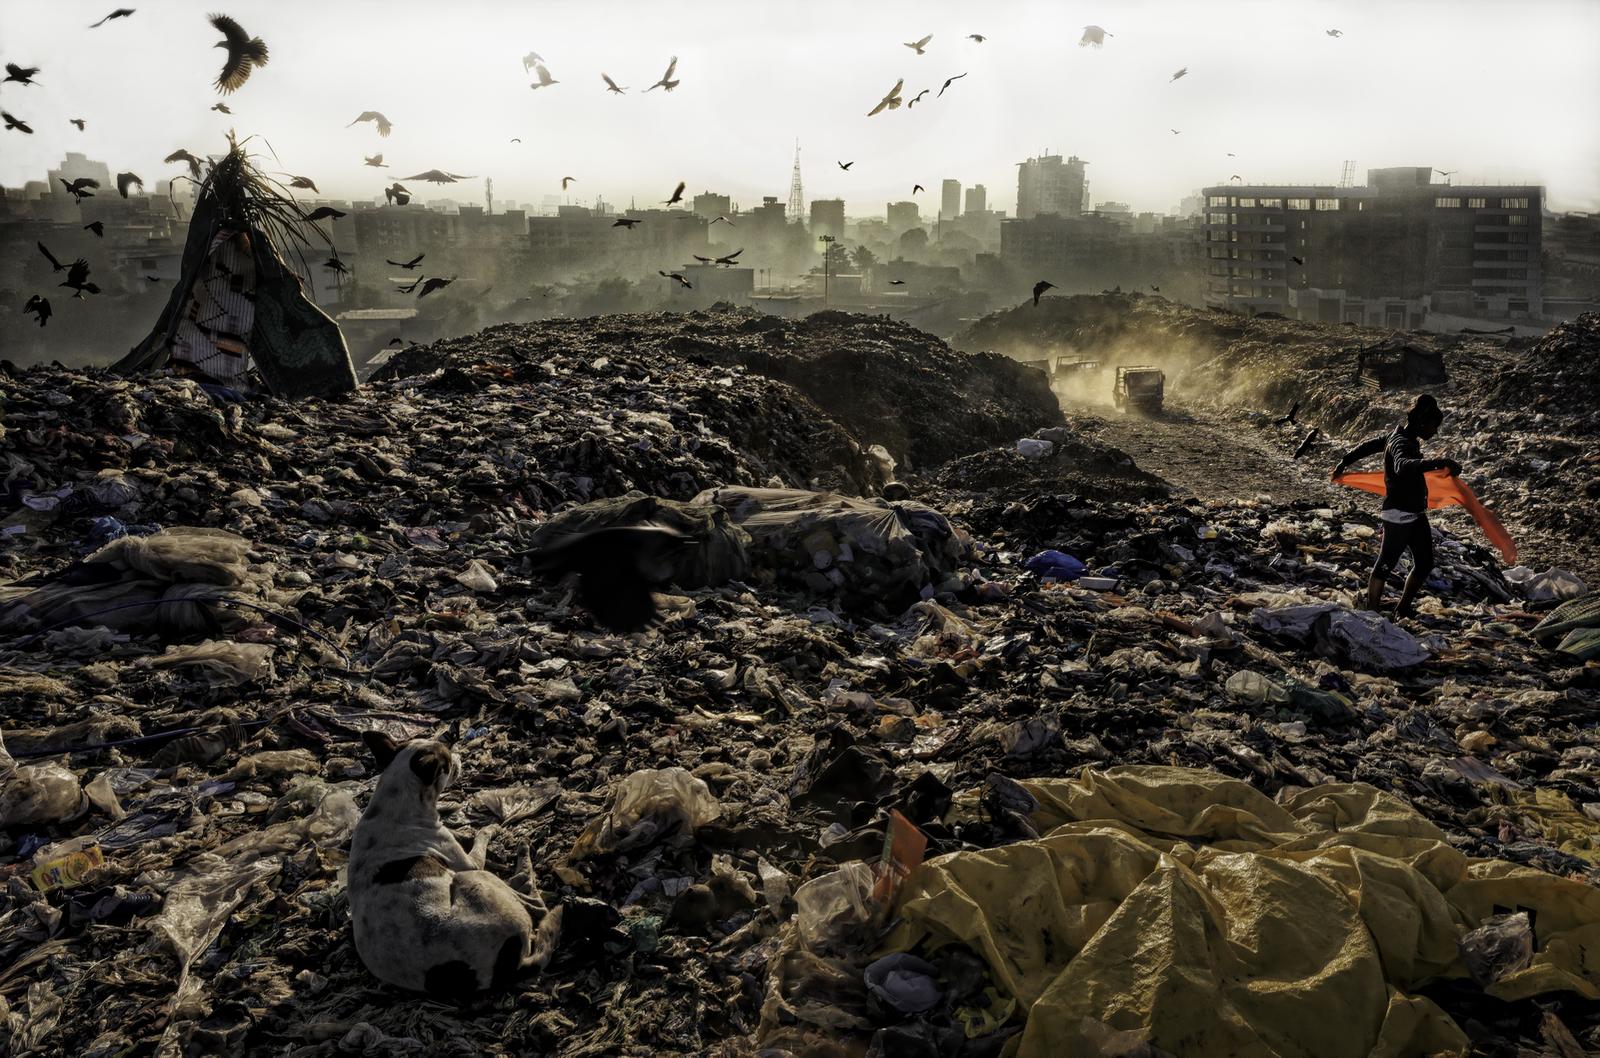 Plastic Workers Live in Landfills